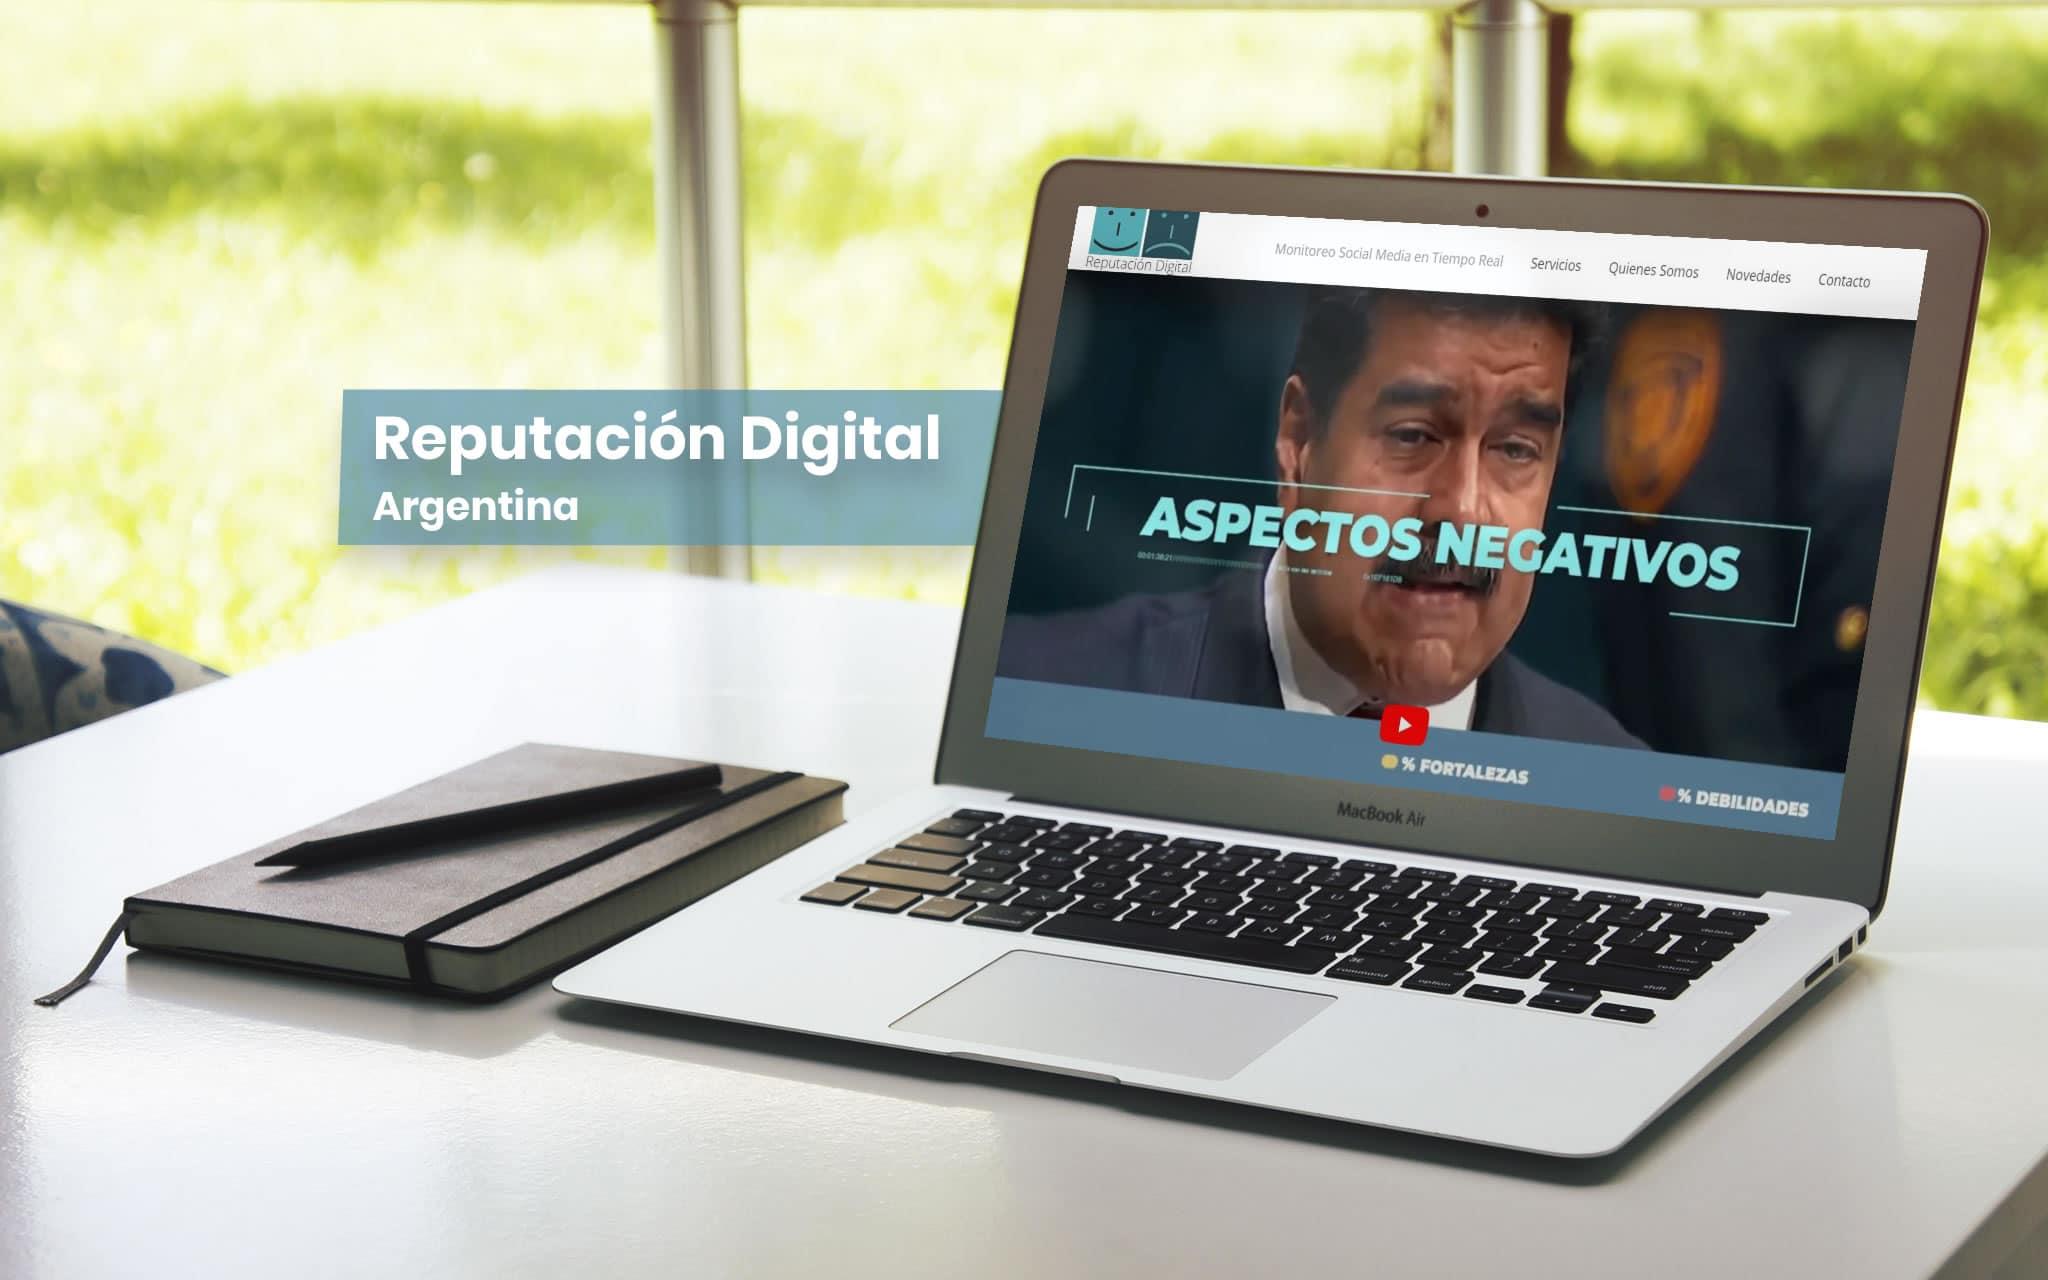 Reputación Digital - Argentina